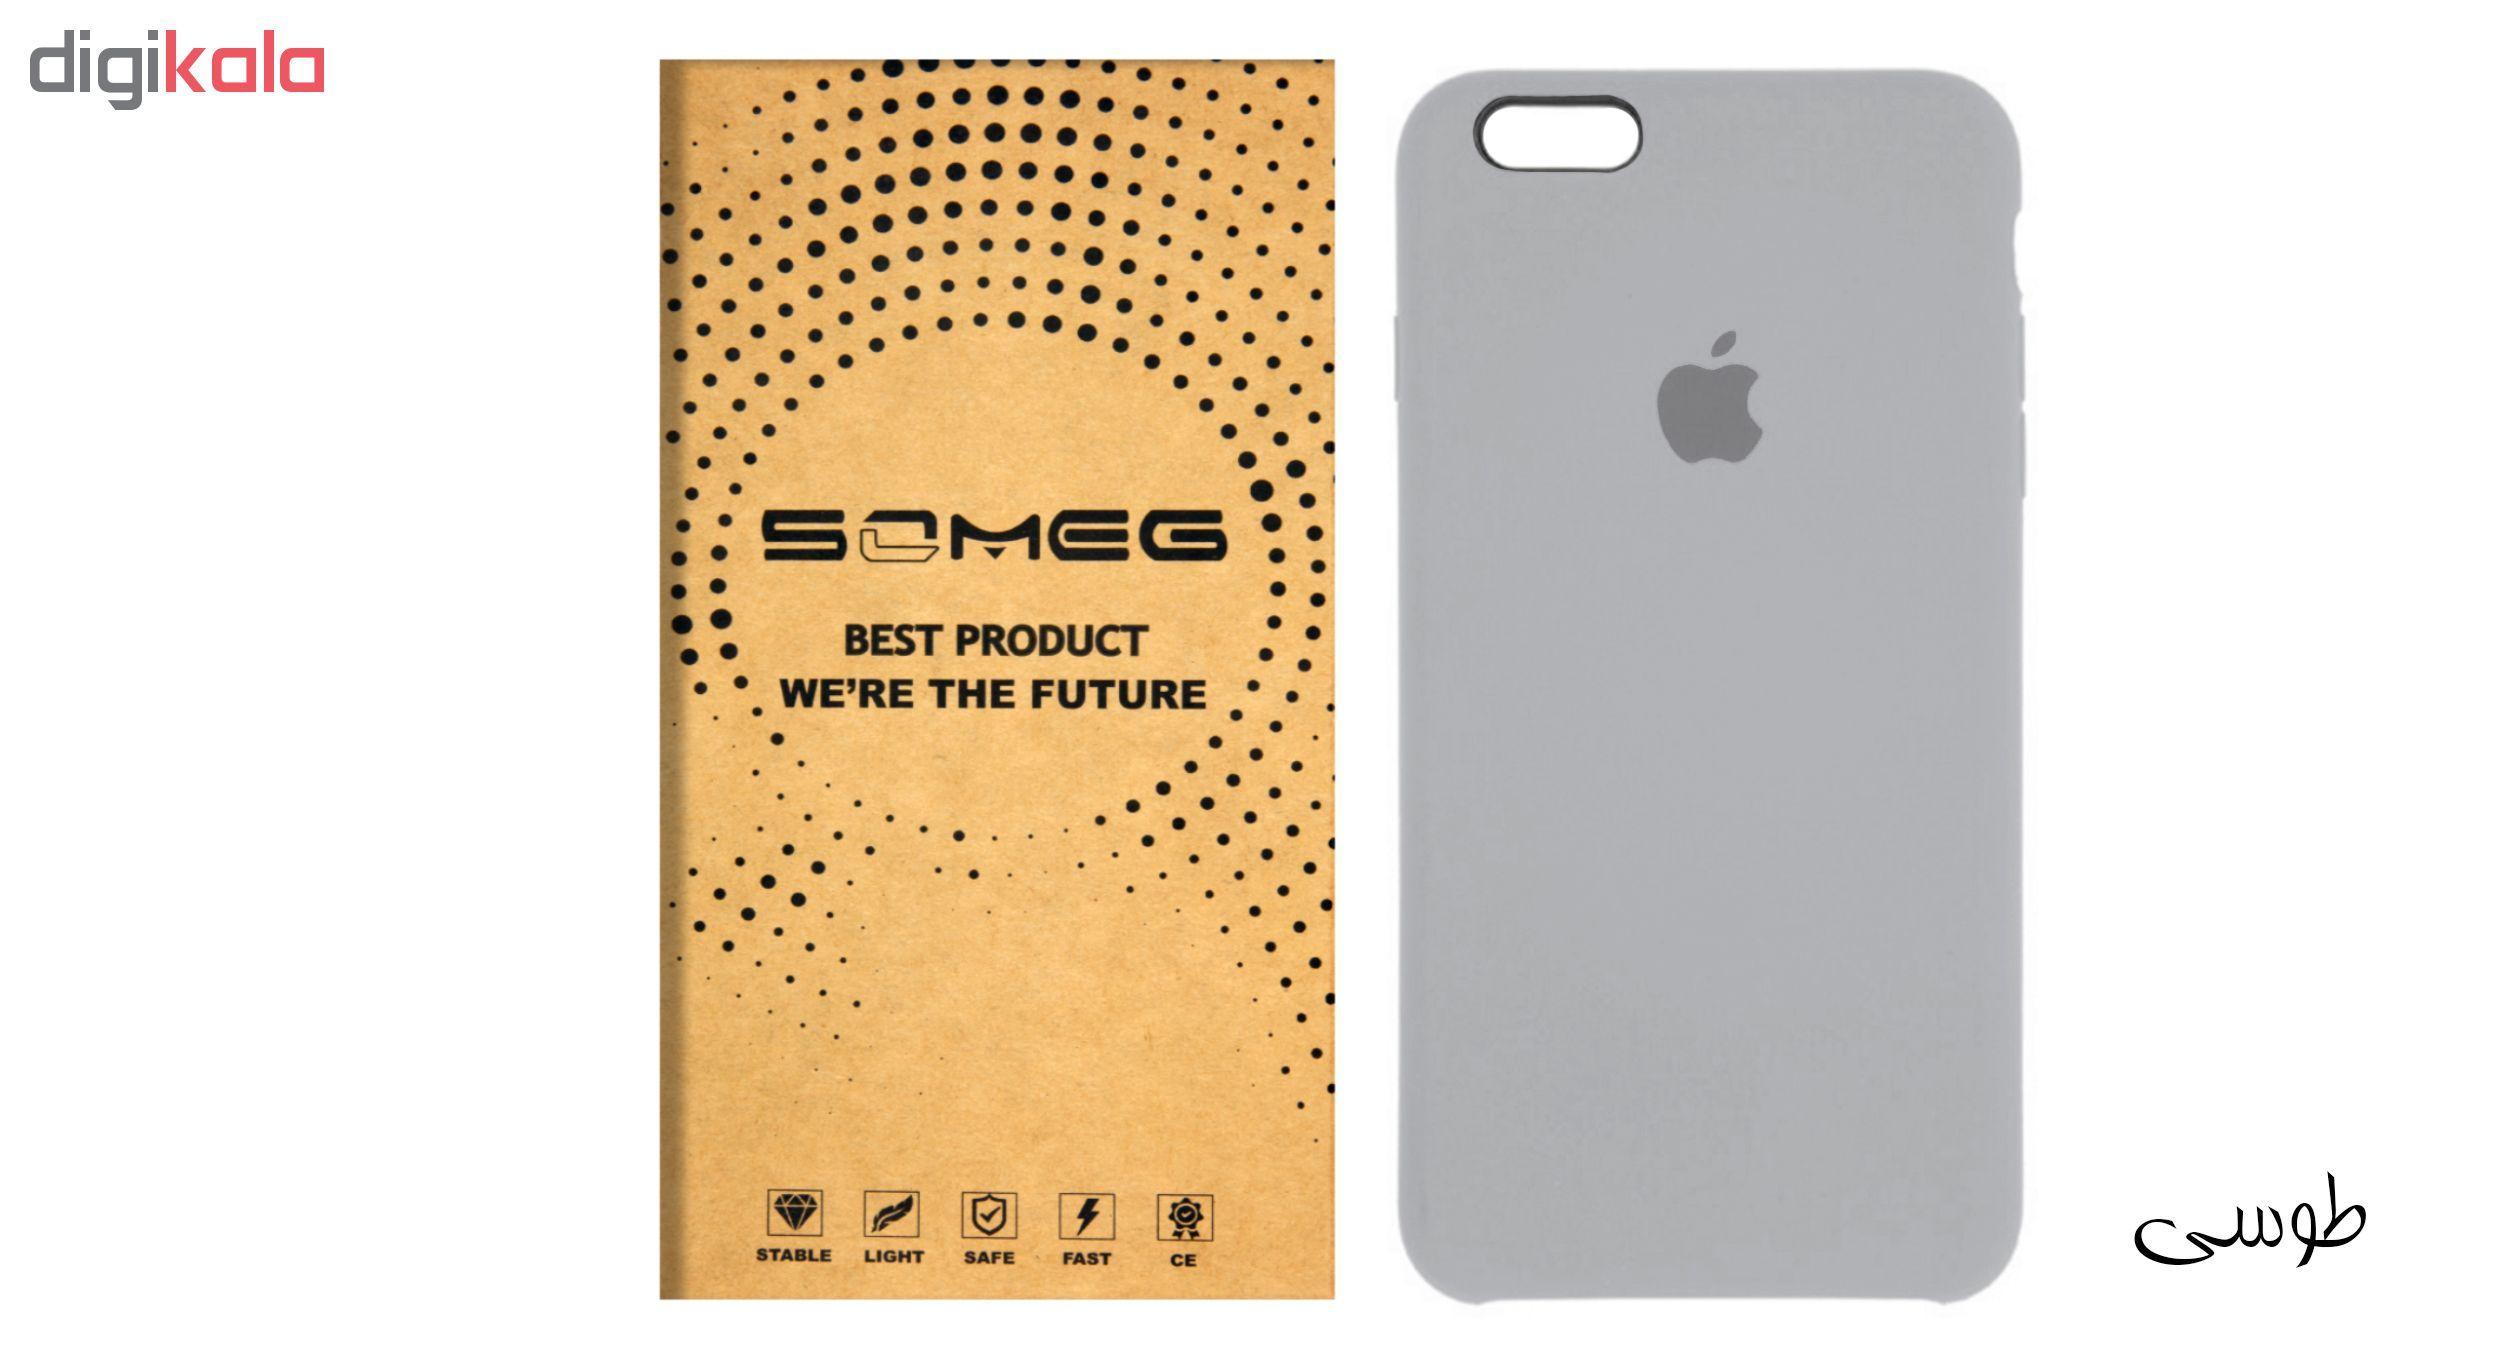 کاور سومگ مدل SIC مناسب برای گوشی موبایل اپل iPhone 6/6s main 1 31